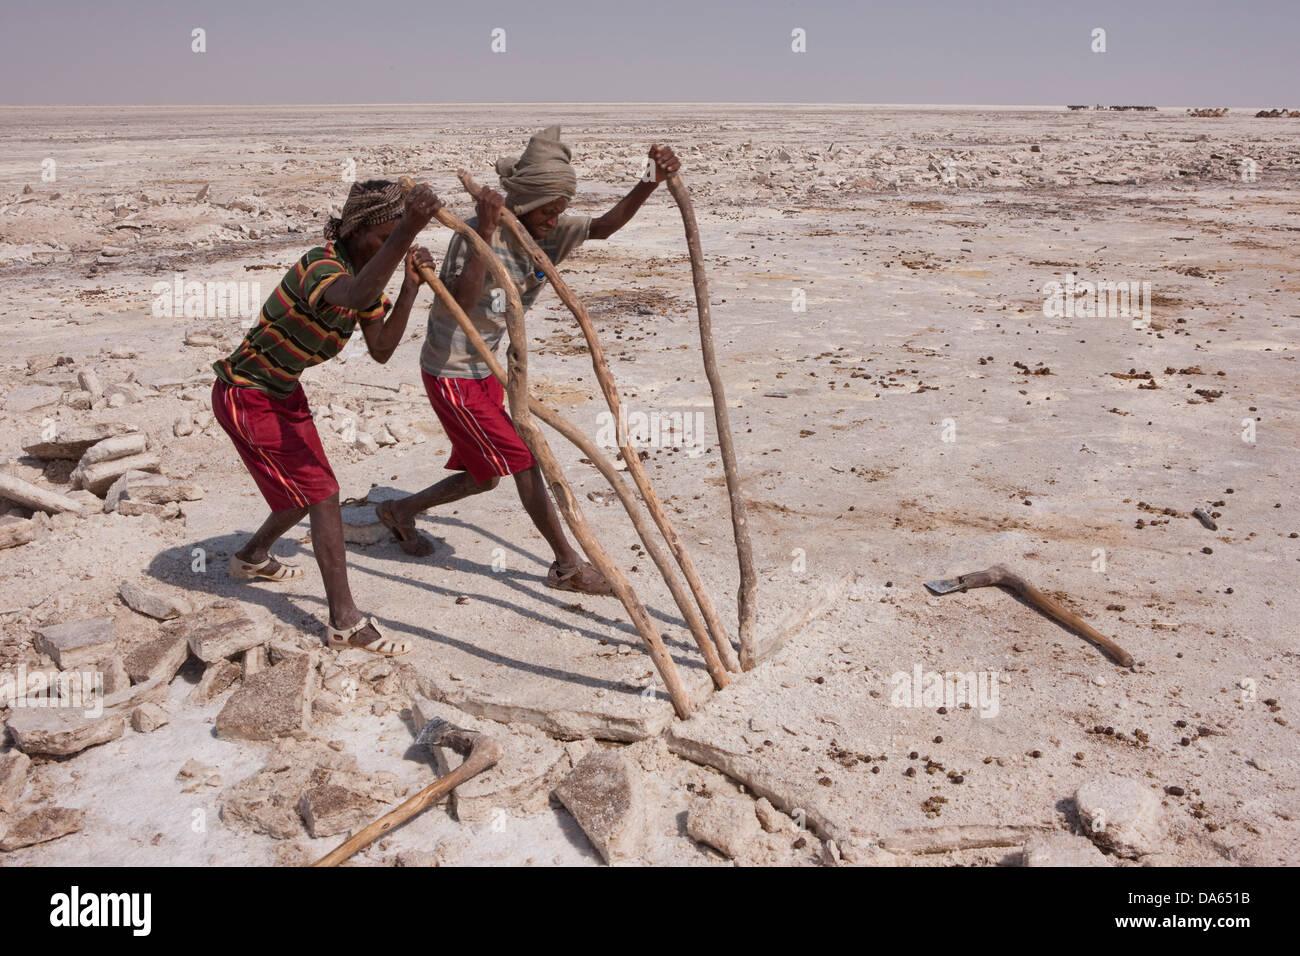 salt mining, Dallol, Danakil, Africa, traffic, transport, salt, saltwork, salt mining, Assale, salt lake, men, workers, - Stock Image